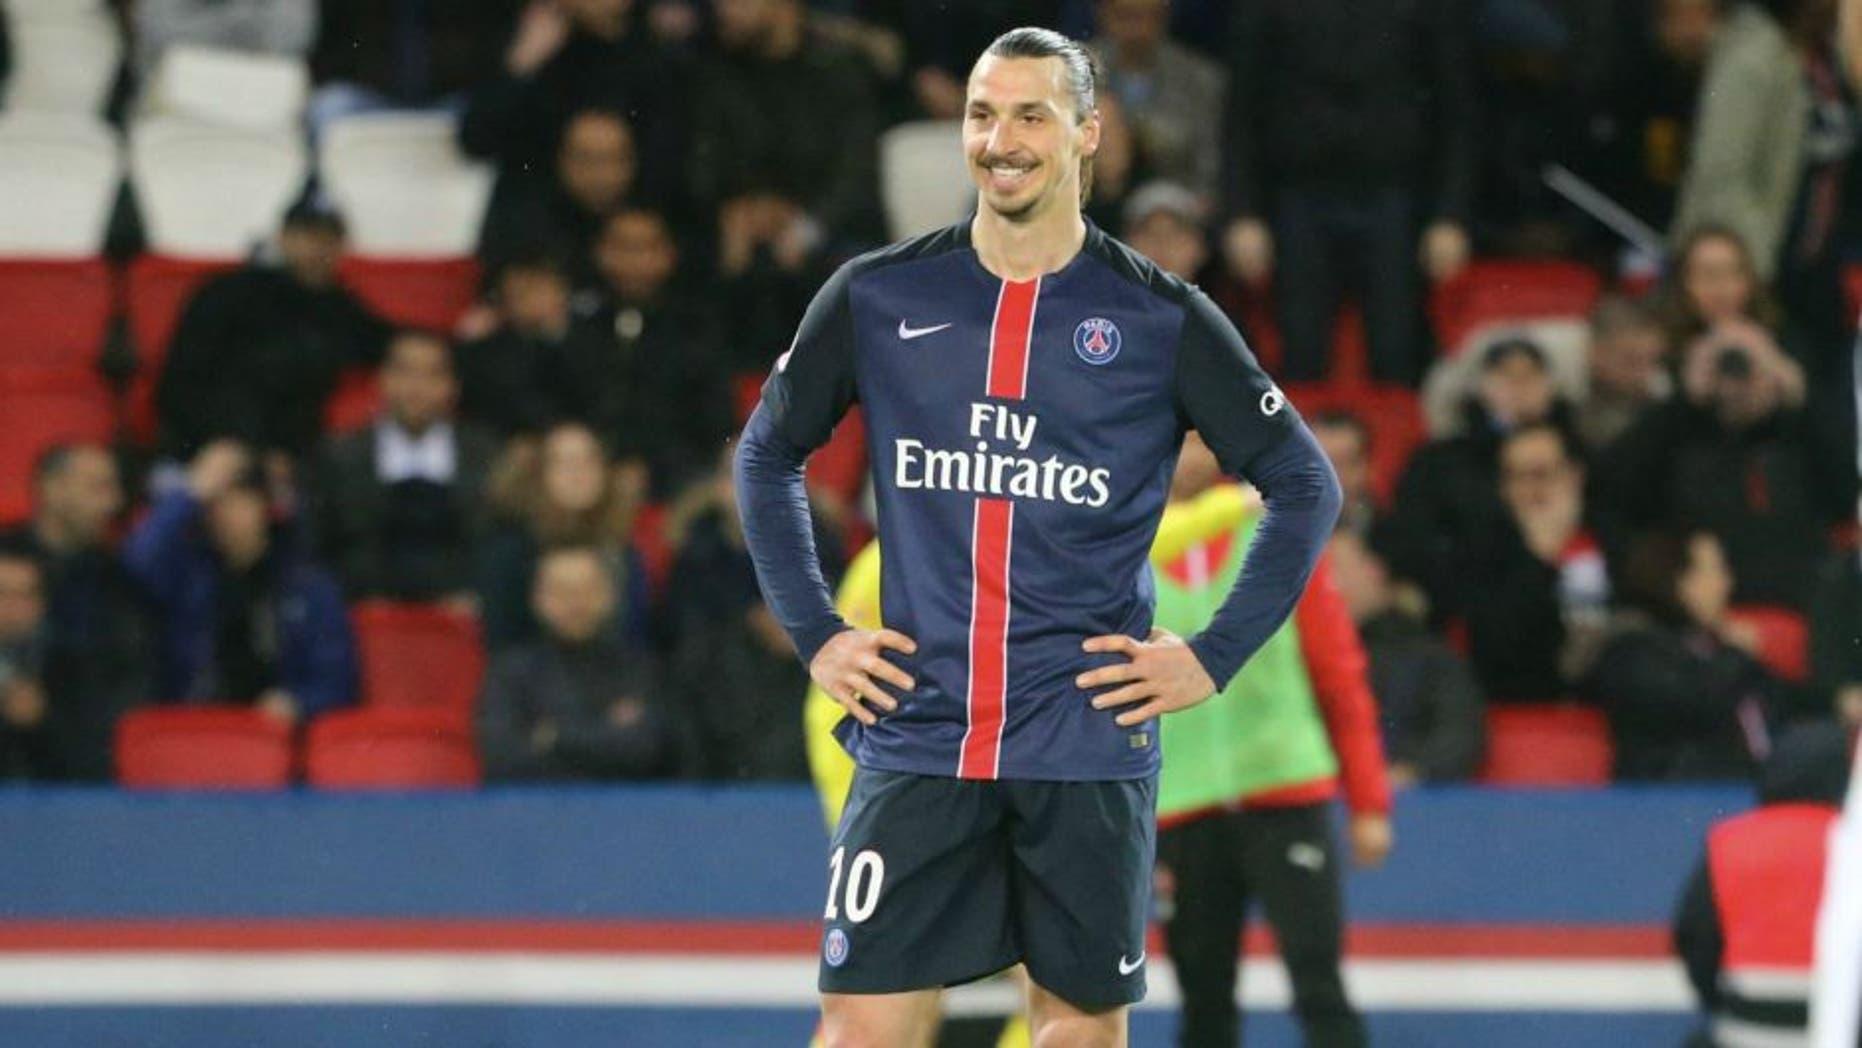 PARIS, FRANCE - APRIL 29: Zlatan Ibrahimovic of Paris Saint-Germain reacts during the French Ligue 1 match between Paris Saint-Germain and Stade Rennais at Parc des Princes on April 29, 2016 in Paris, France. (Photo by Xavier Laine/Getty Images)